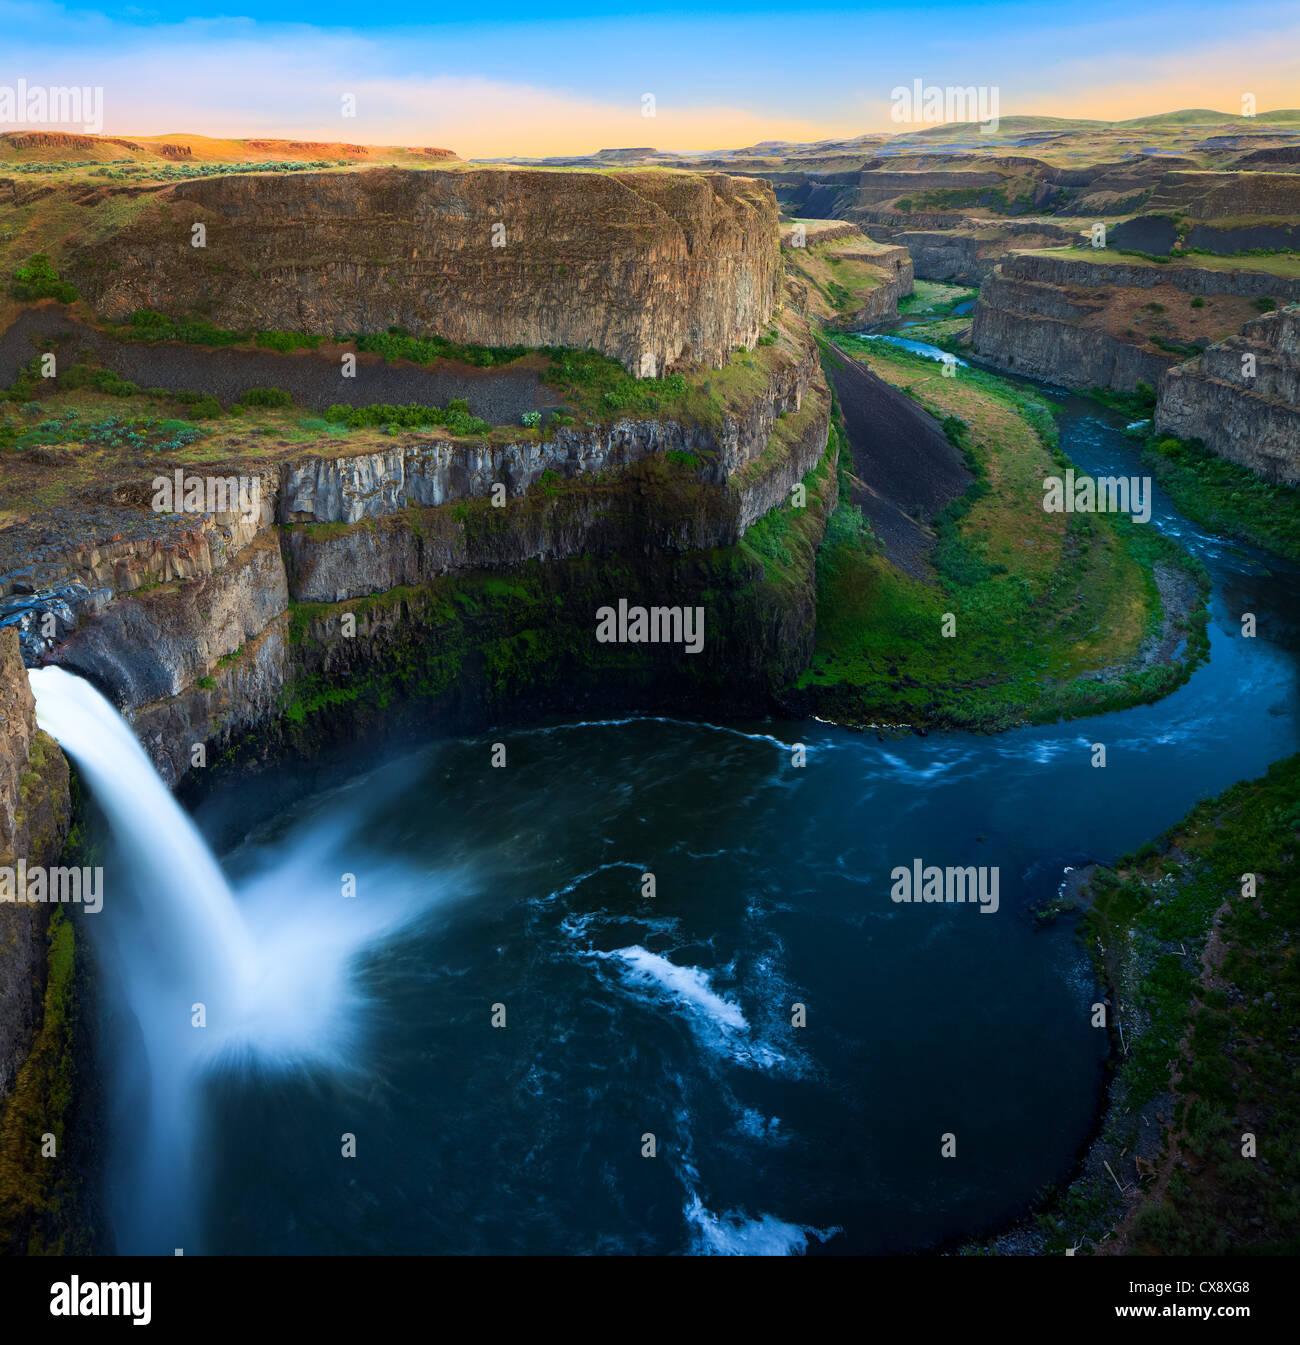 Palouse Falls state park in eastern Washington state, USA - Stock Image